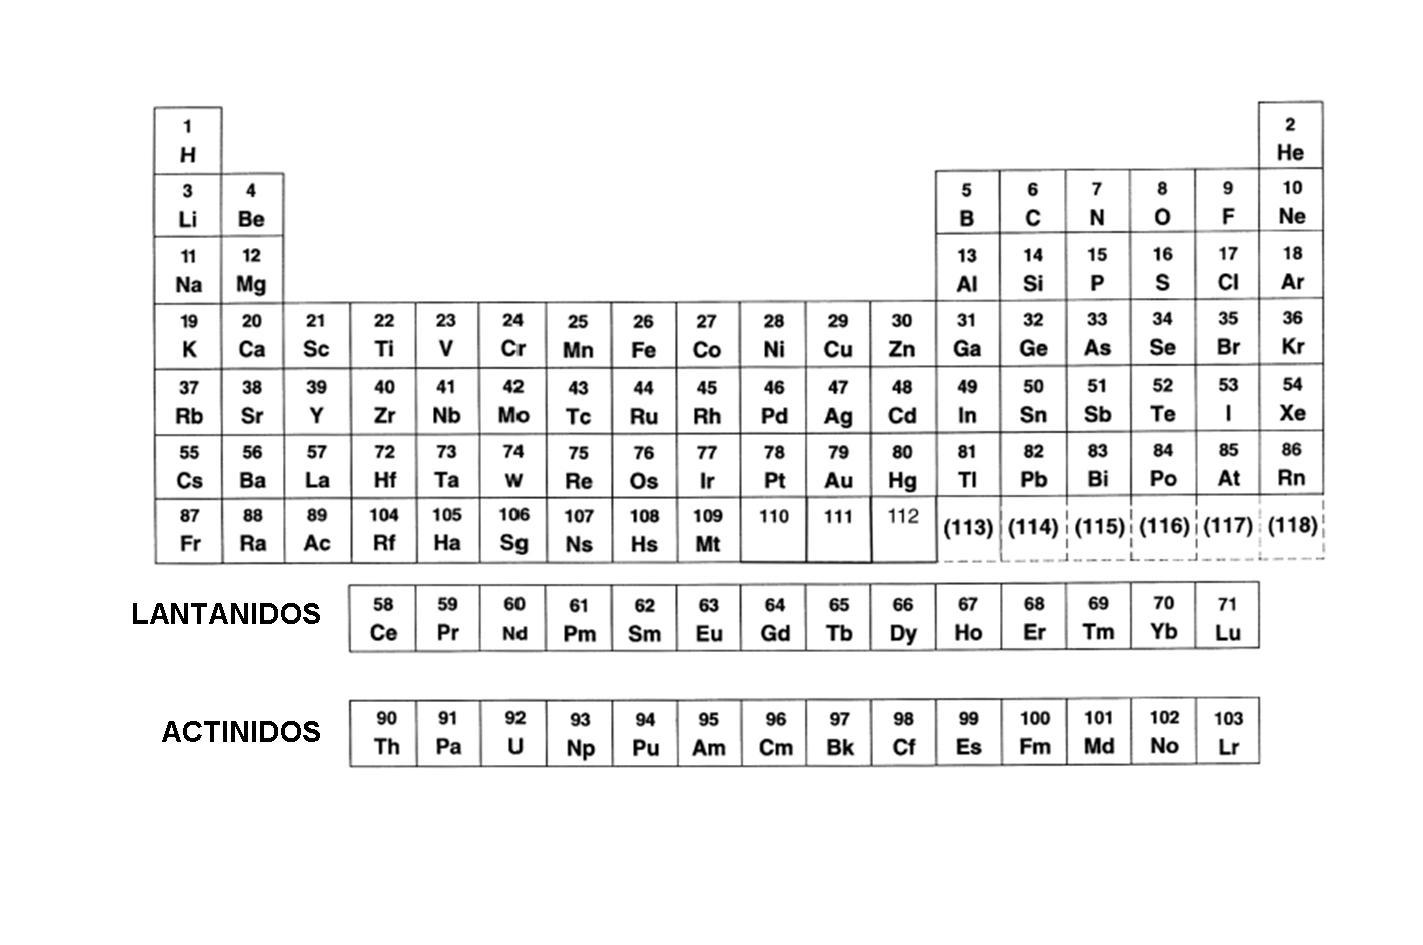 Ii carnaval de qumica breve explicacin de la tabla peridica ii carnaval de qumica breve explicacin de la tabla peridica la enciclopedia galctica urtaz Gallery